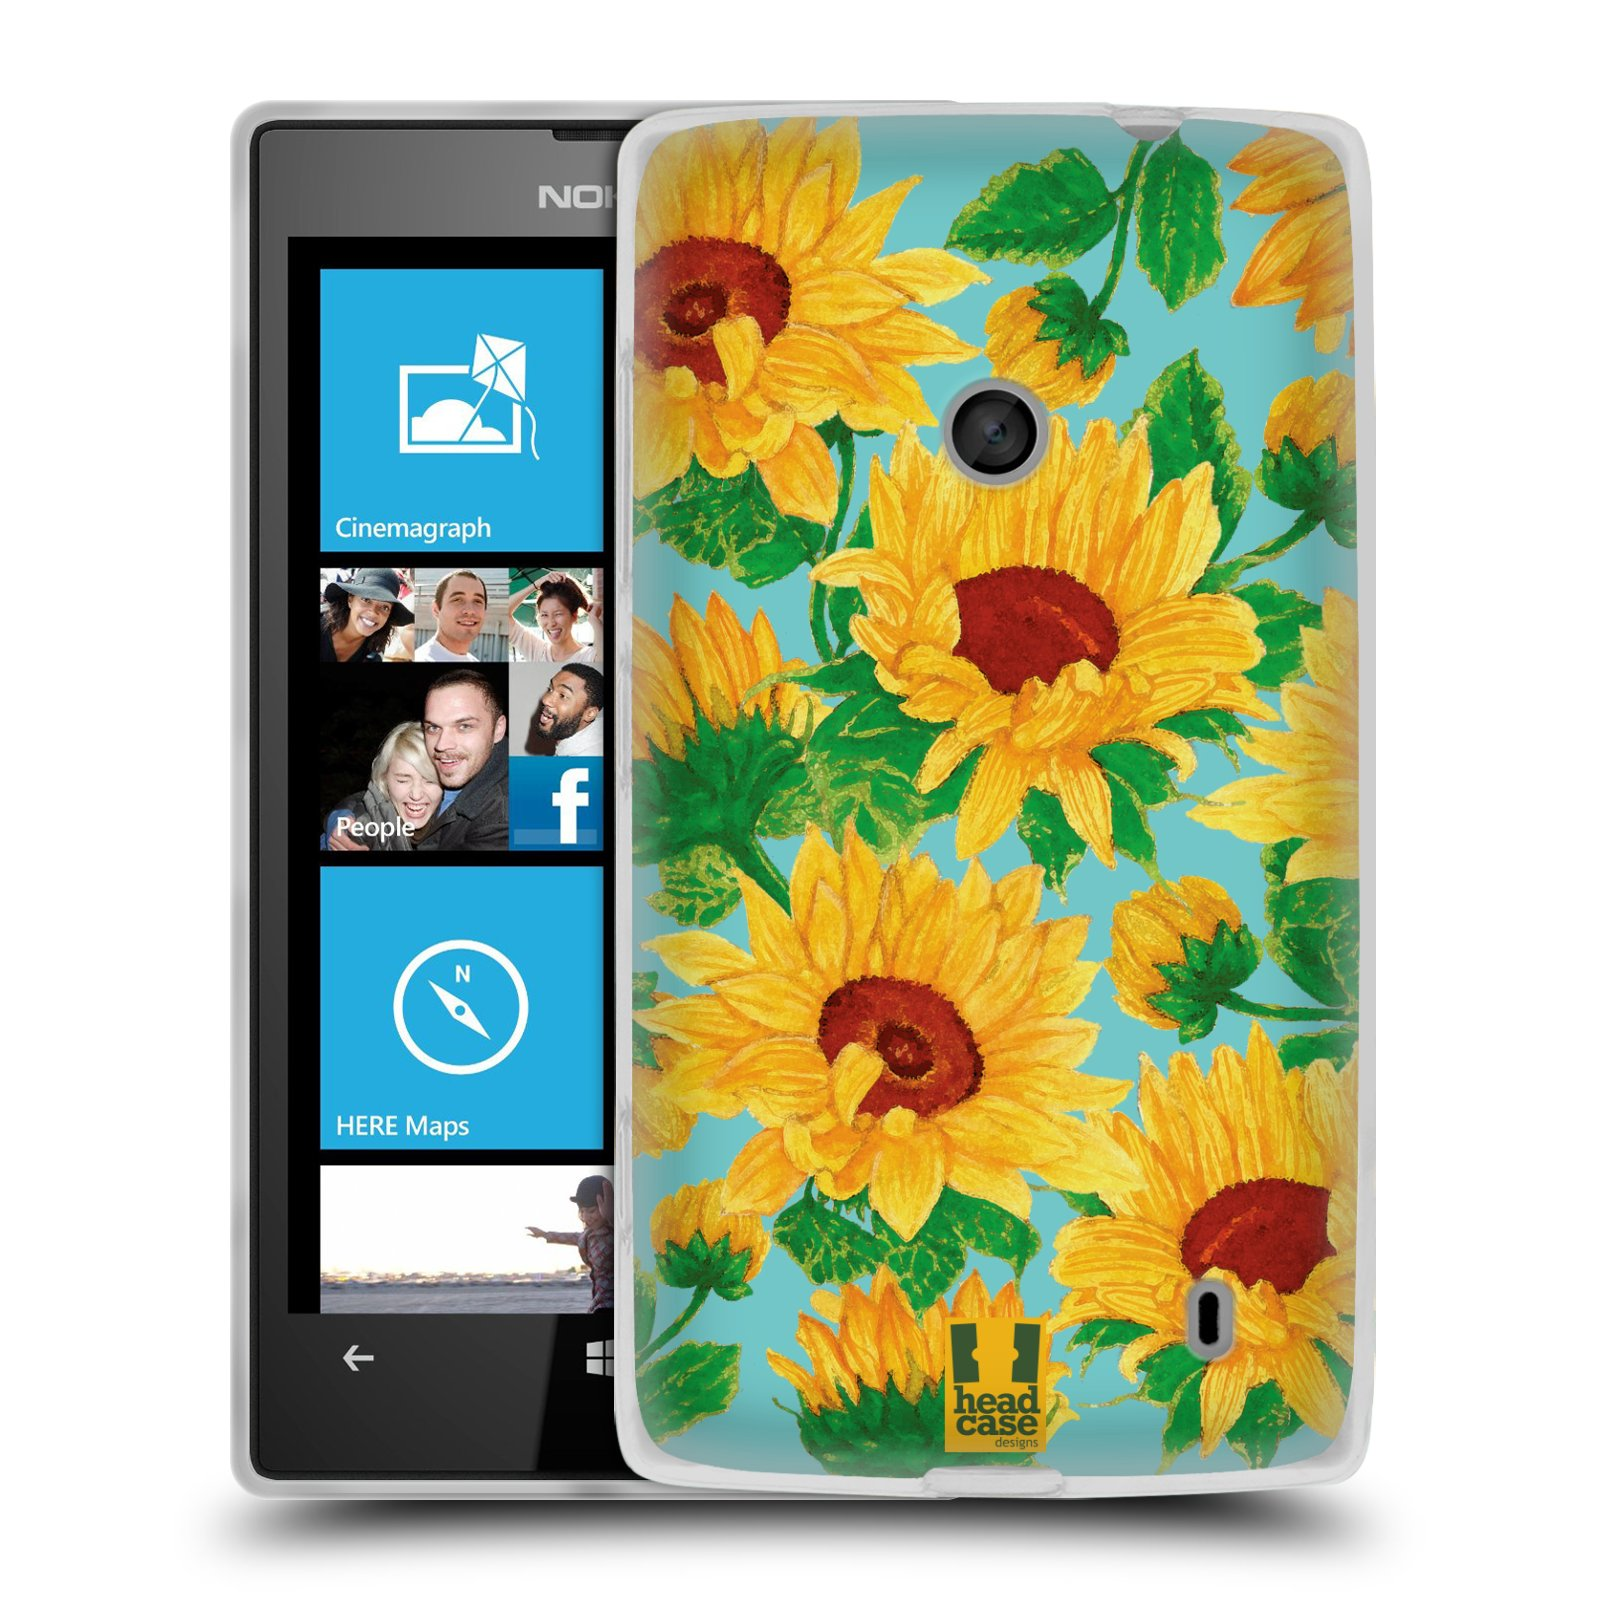 Silikonové pouzdro na mobil Nokia Lumia 520 HEAD CASE Slunečnice (Silikonový Kryt či obal na mobilní telefon Nokia Lumia 520)